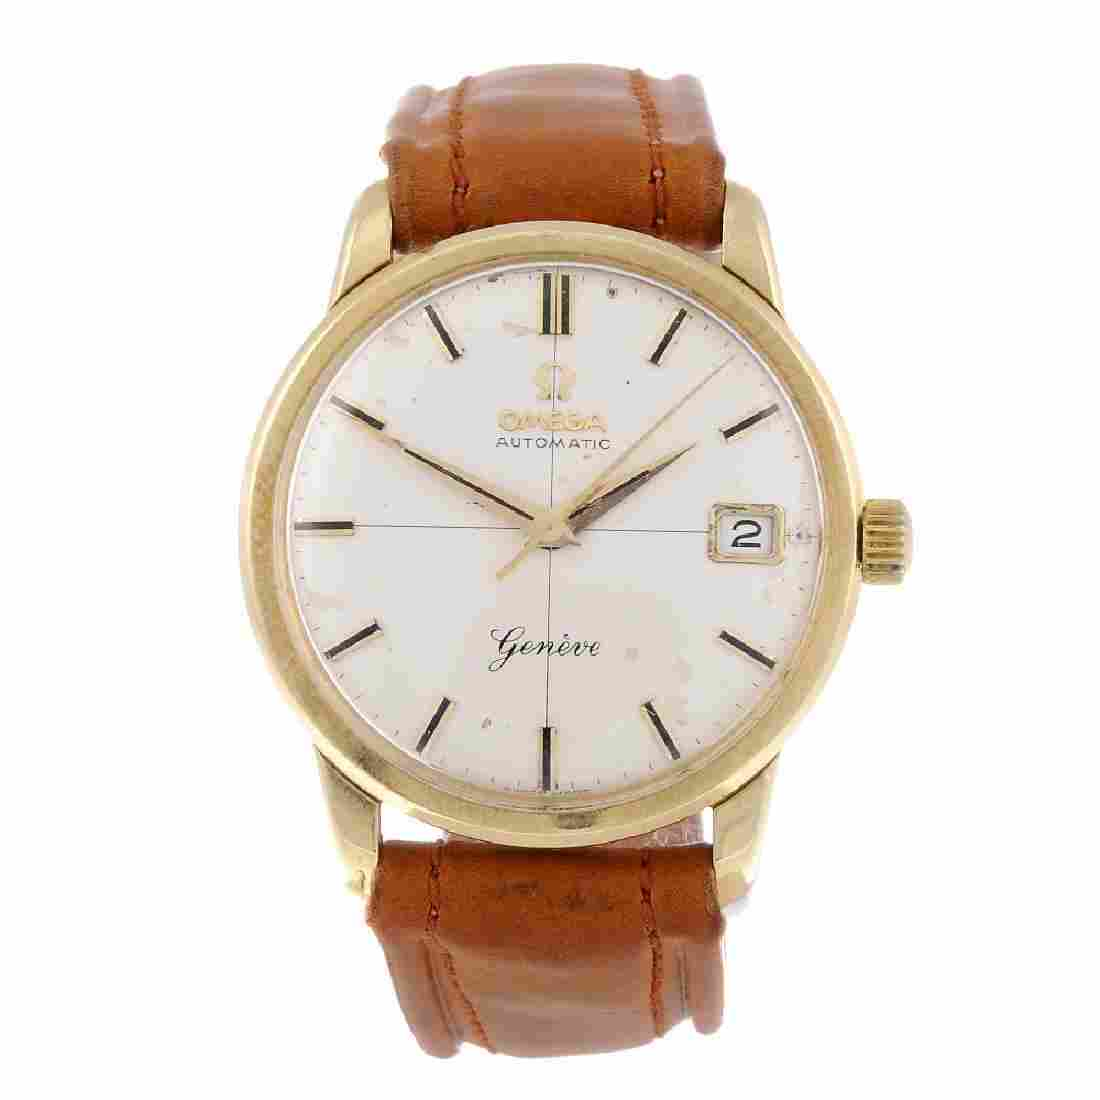 OMEGA - a gentleman's Genève wrist watch. Yellow metal